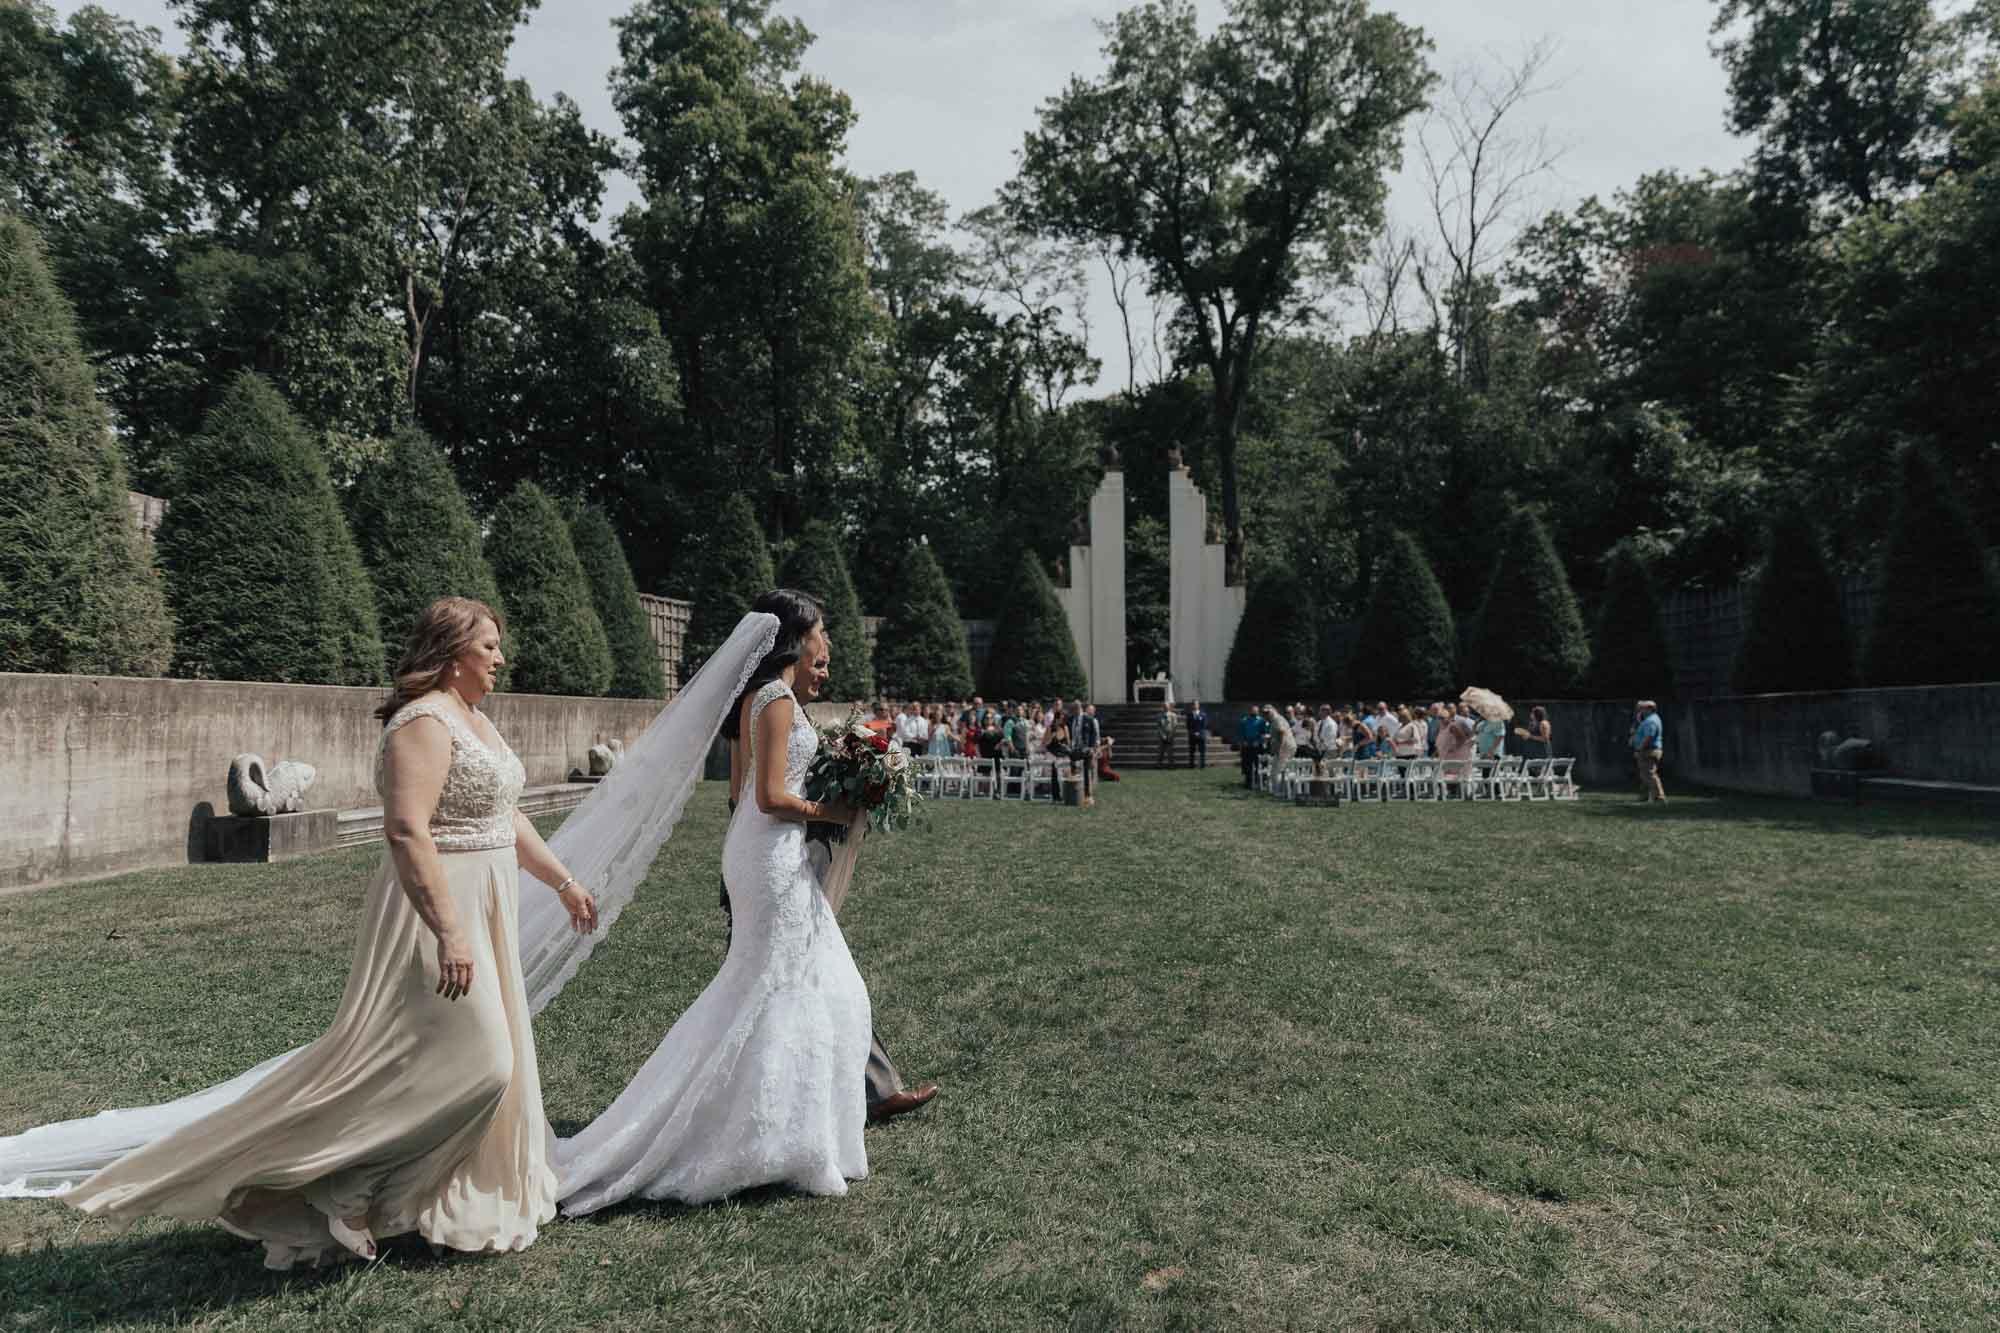 champaign_il_wedding_photography-0270.jpg